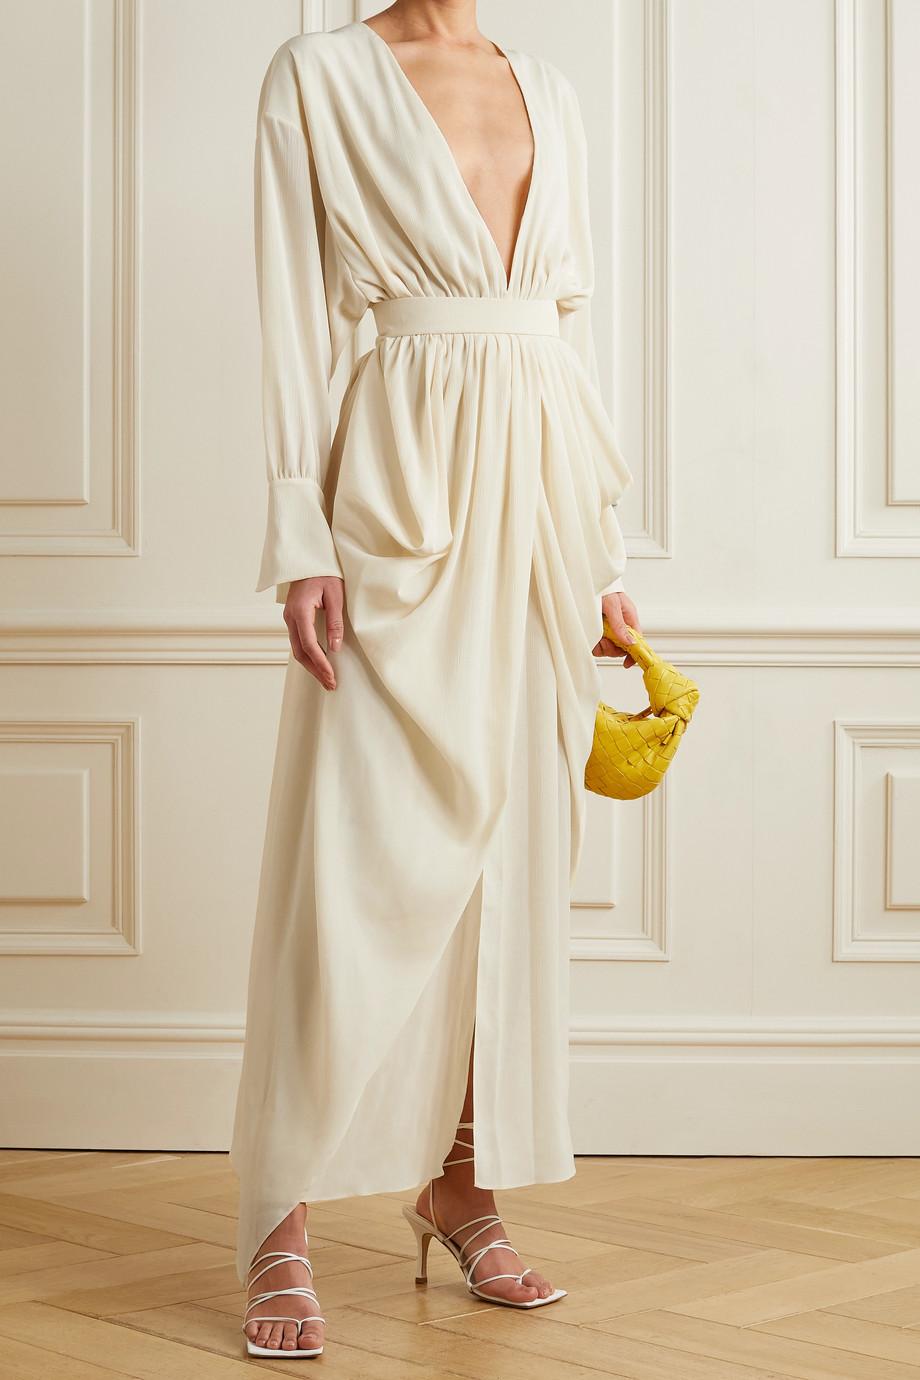 A.W.A.K.E. MODE Gathered draped crepon maxi dress